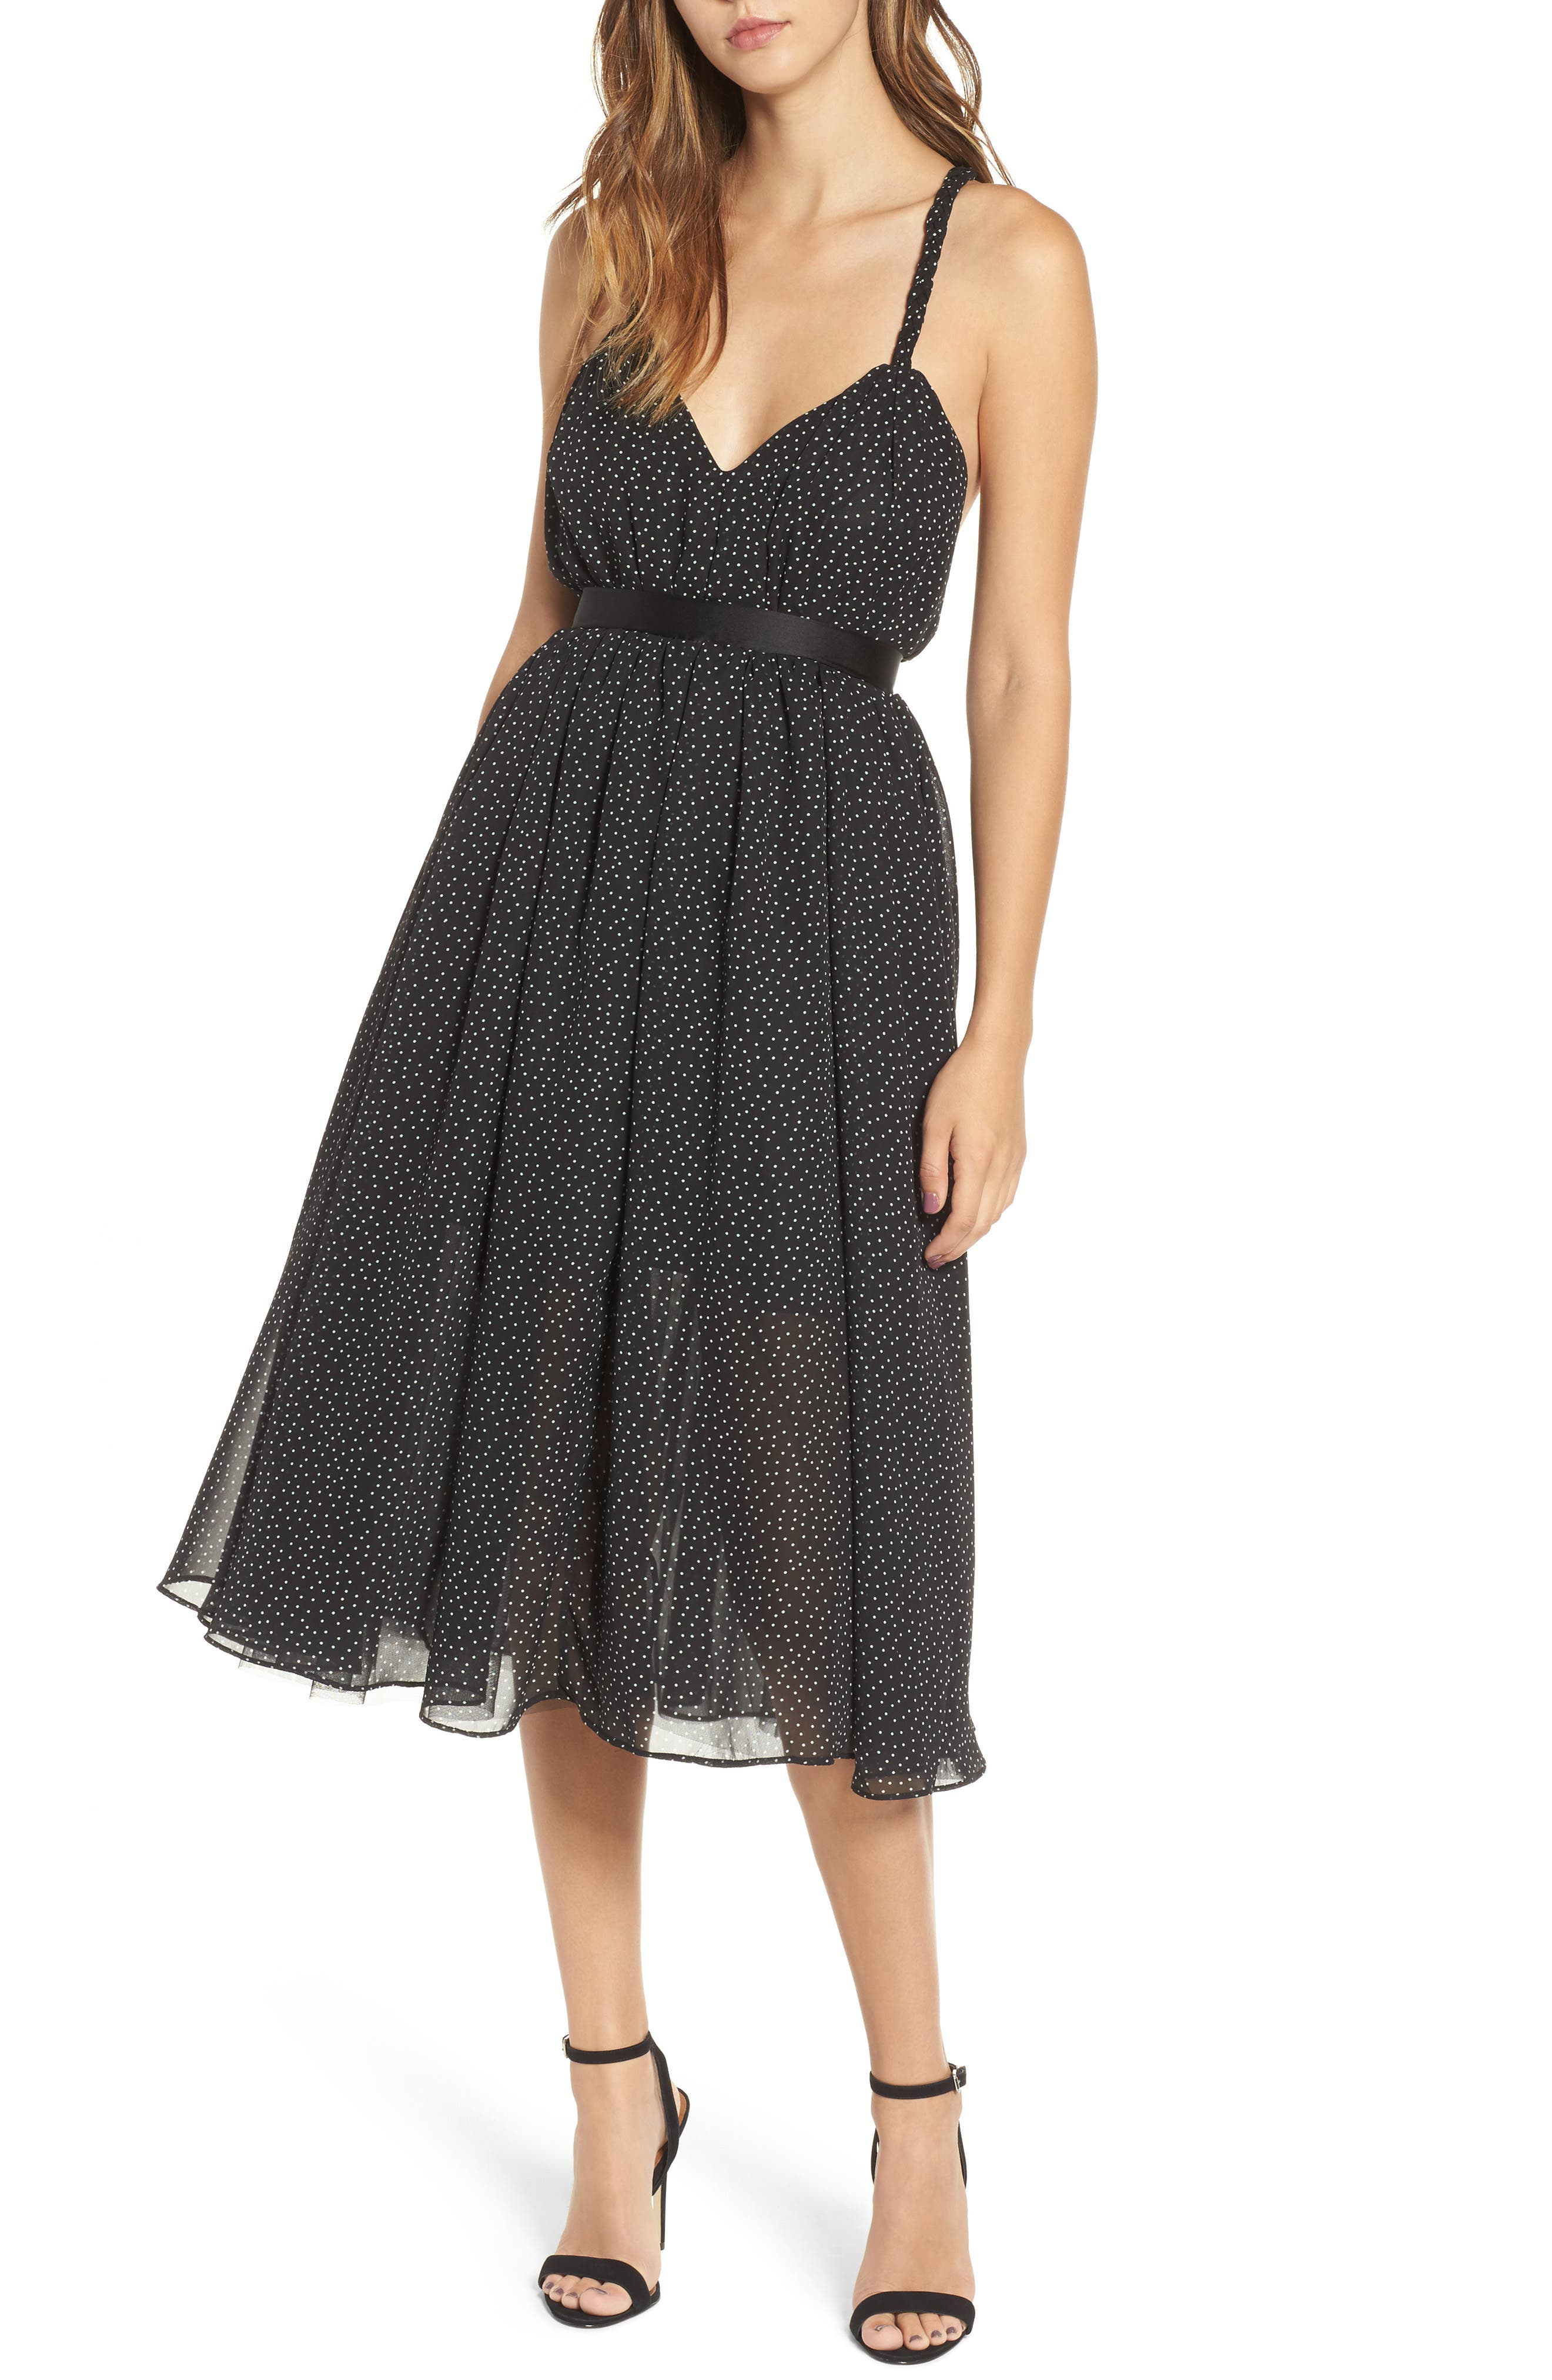 StyleKeepers The Marilyn Midi Dress